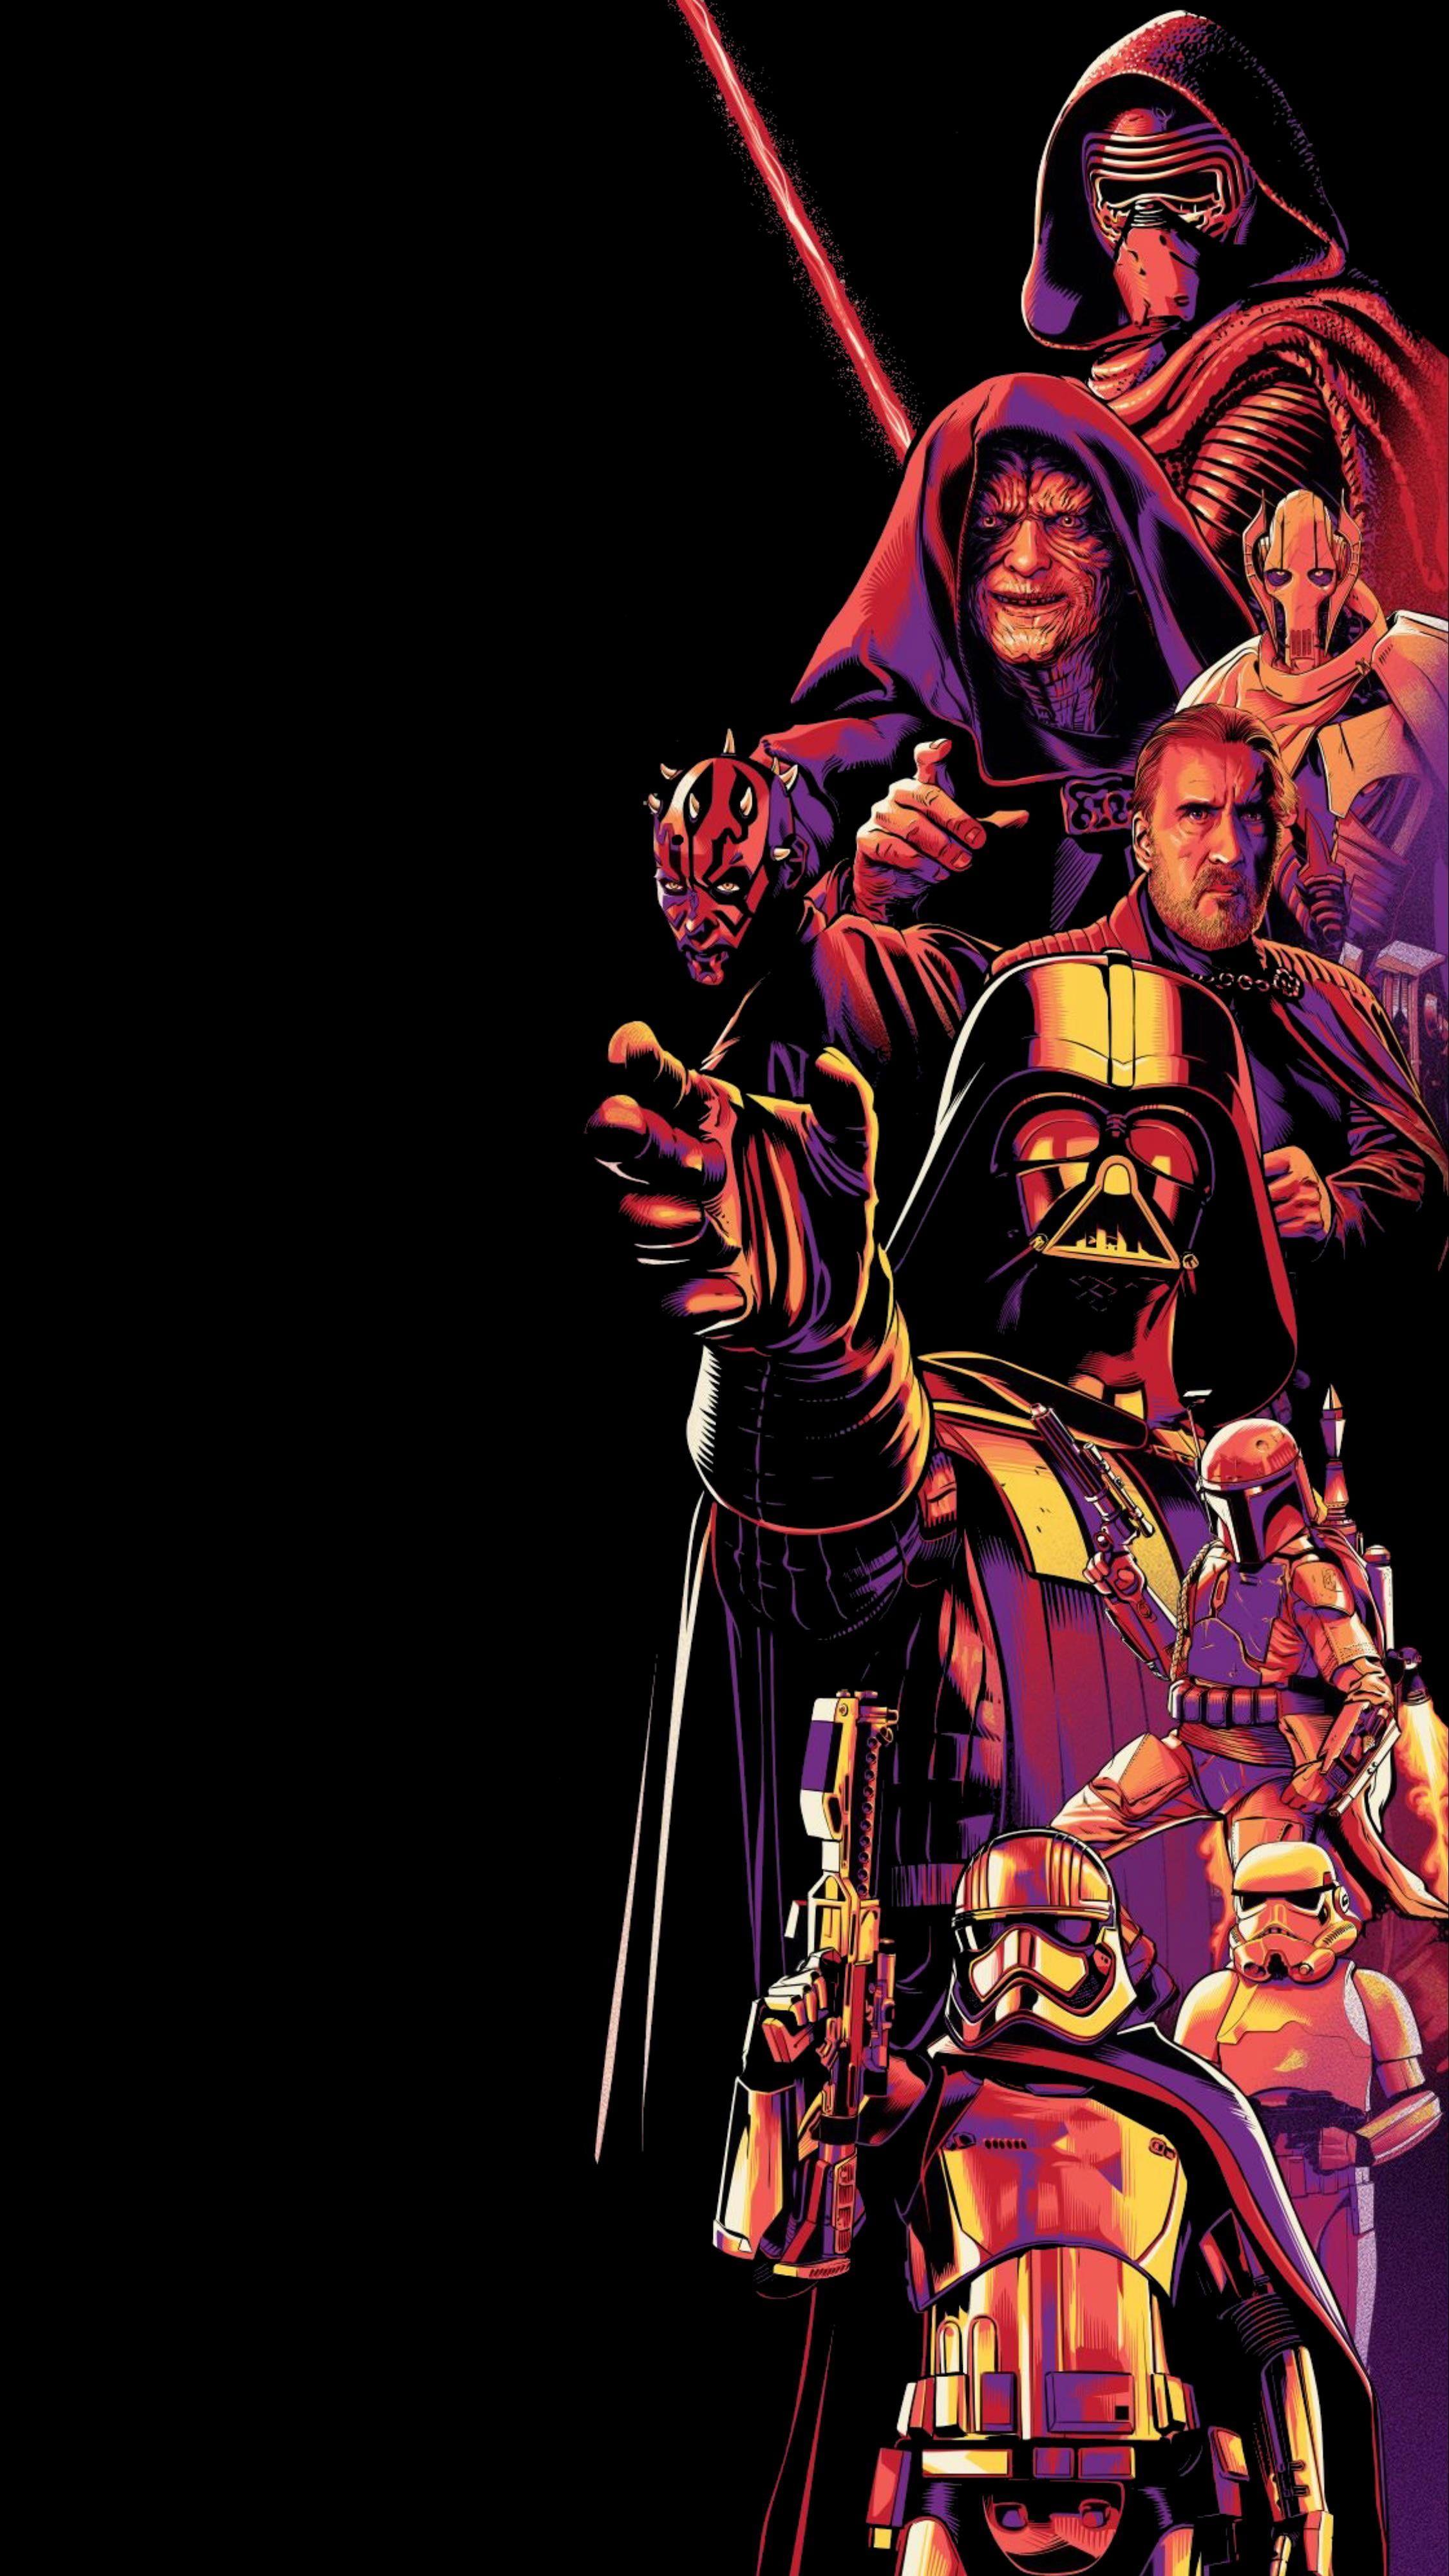 Amoled Dark Wallpaper Star Wars Vertical Star Wars Background Star Wars Wallpaper Star Wars Villains